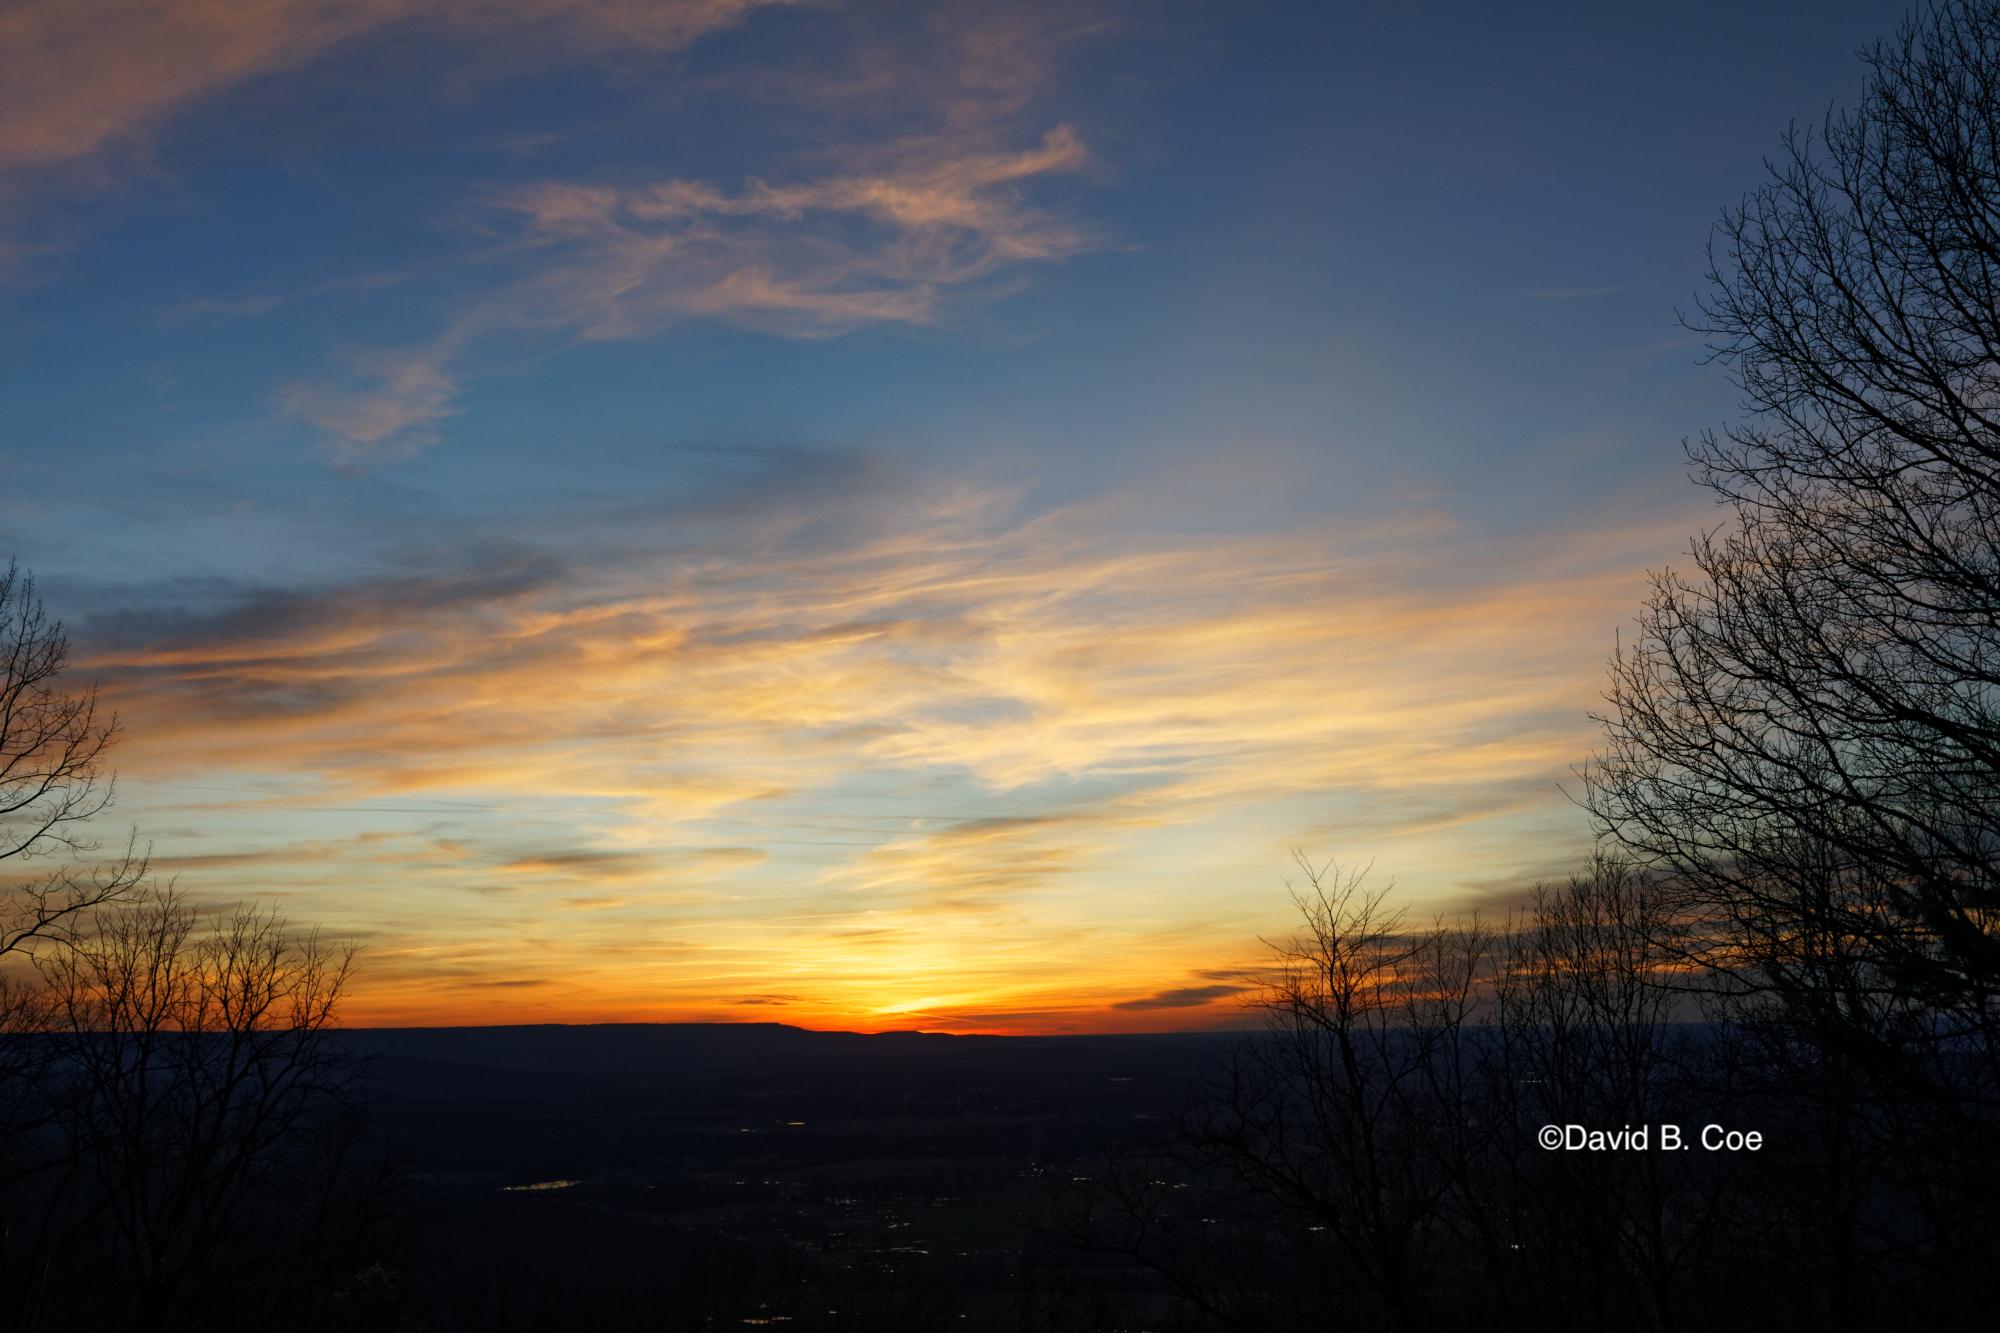 January Twilight, by David B. Coe